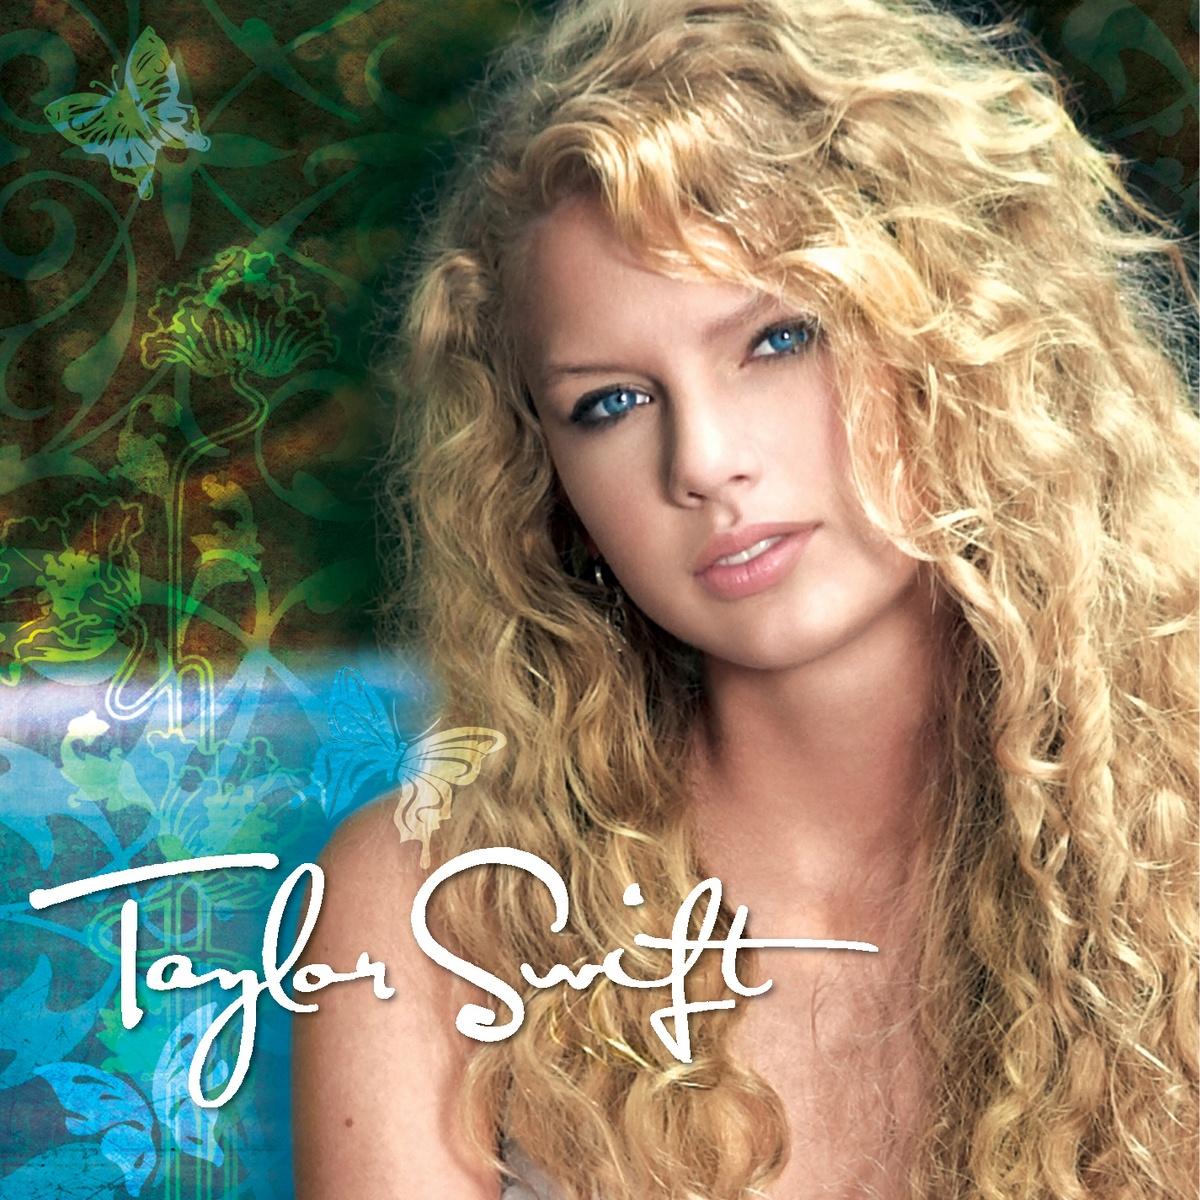 http://4.bp.blogspot.com/-cBsjJ2-9BHQ/TkQXr-E6E9I/AAAAAAAAACs/ESkPYfGR2aE/s1600/Taylor-Swift-Songs.jpg